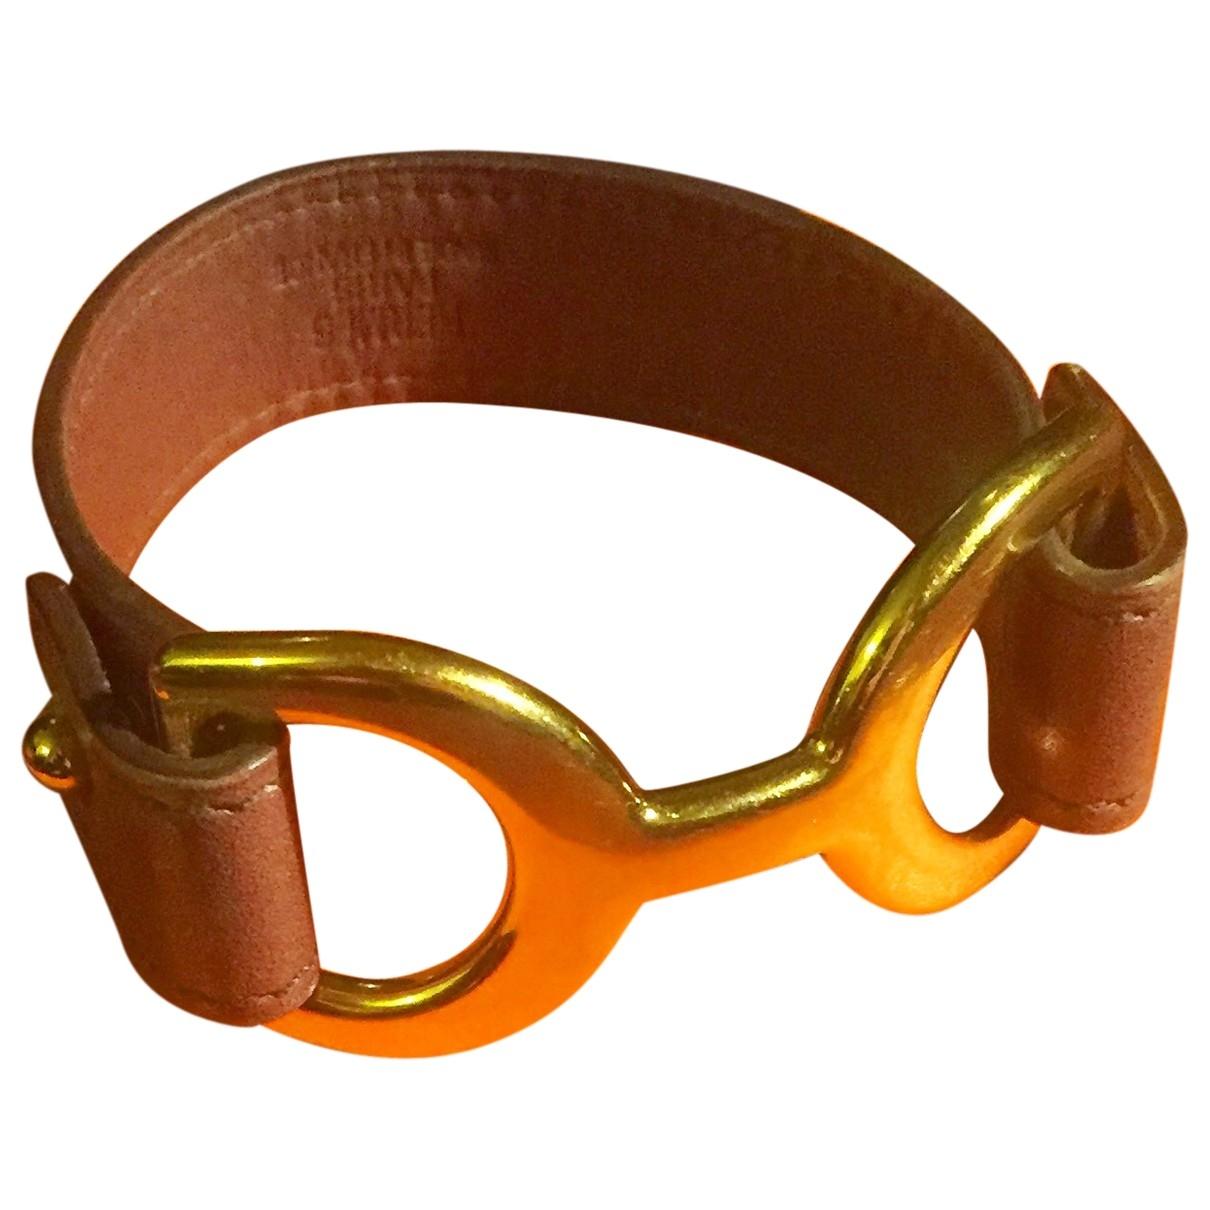 Hermes - Bracelet Pavane pour femme en cuir